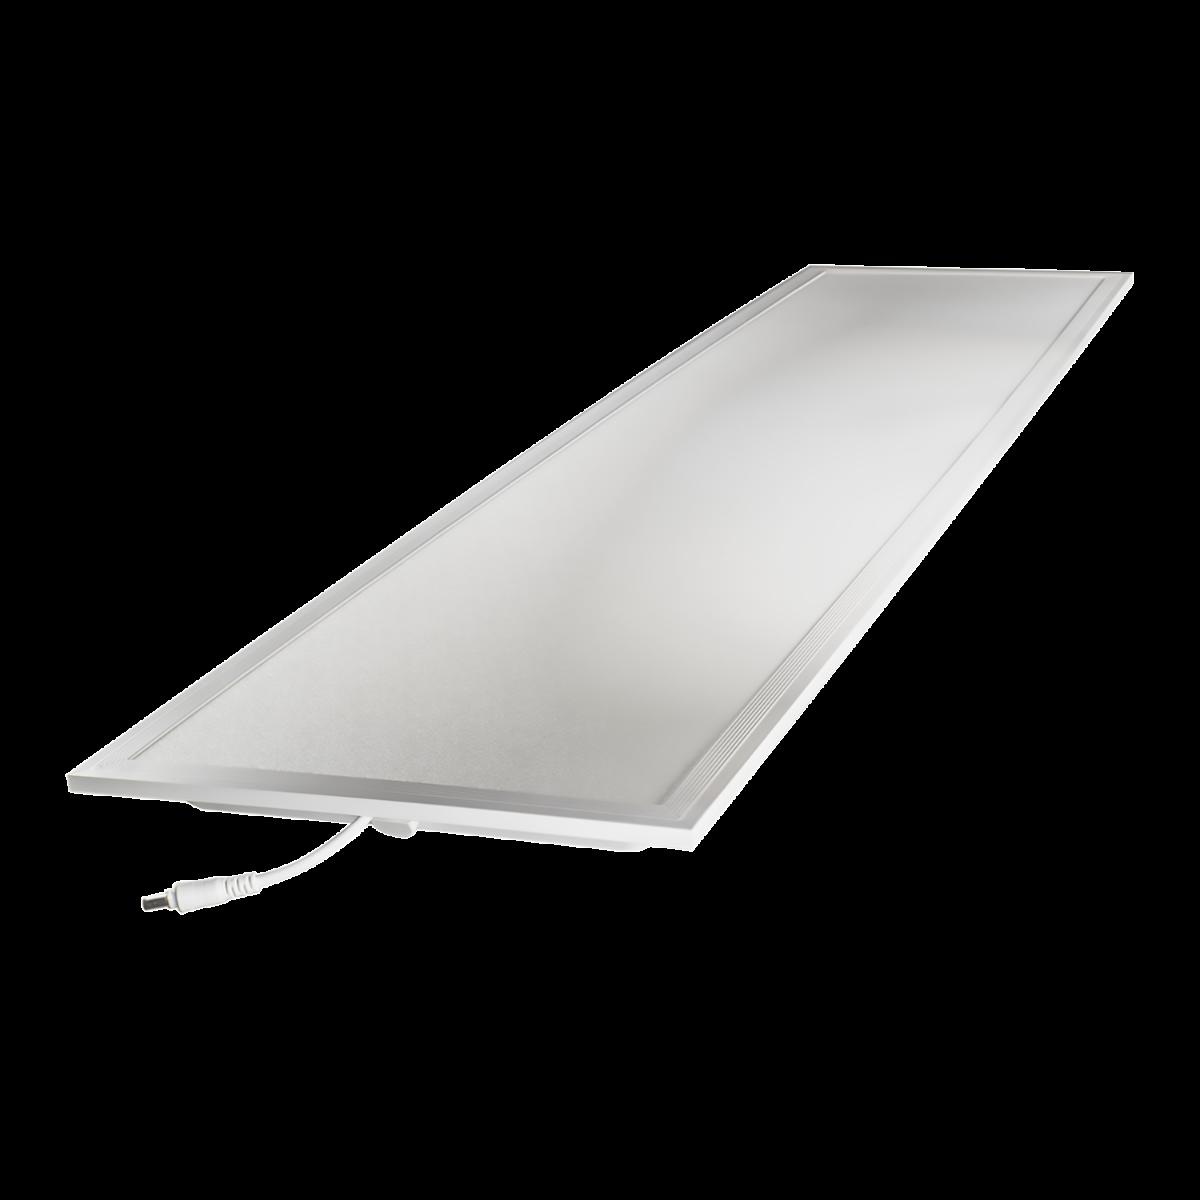 Noxion LED Panel Delta Pro V2.0 30W 30x120cm 4000K 4110lm UGR <19   Kallvit - Ersättare 2x36W